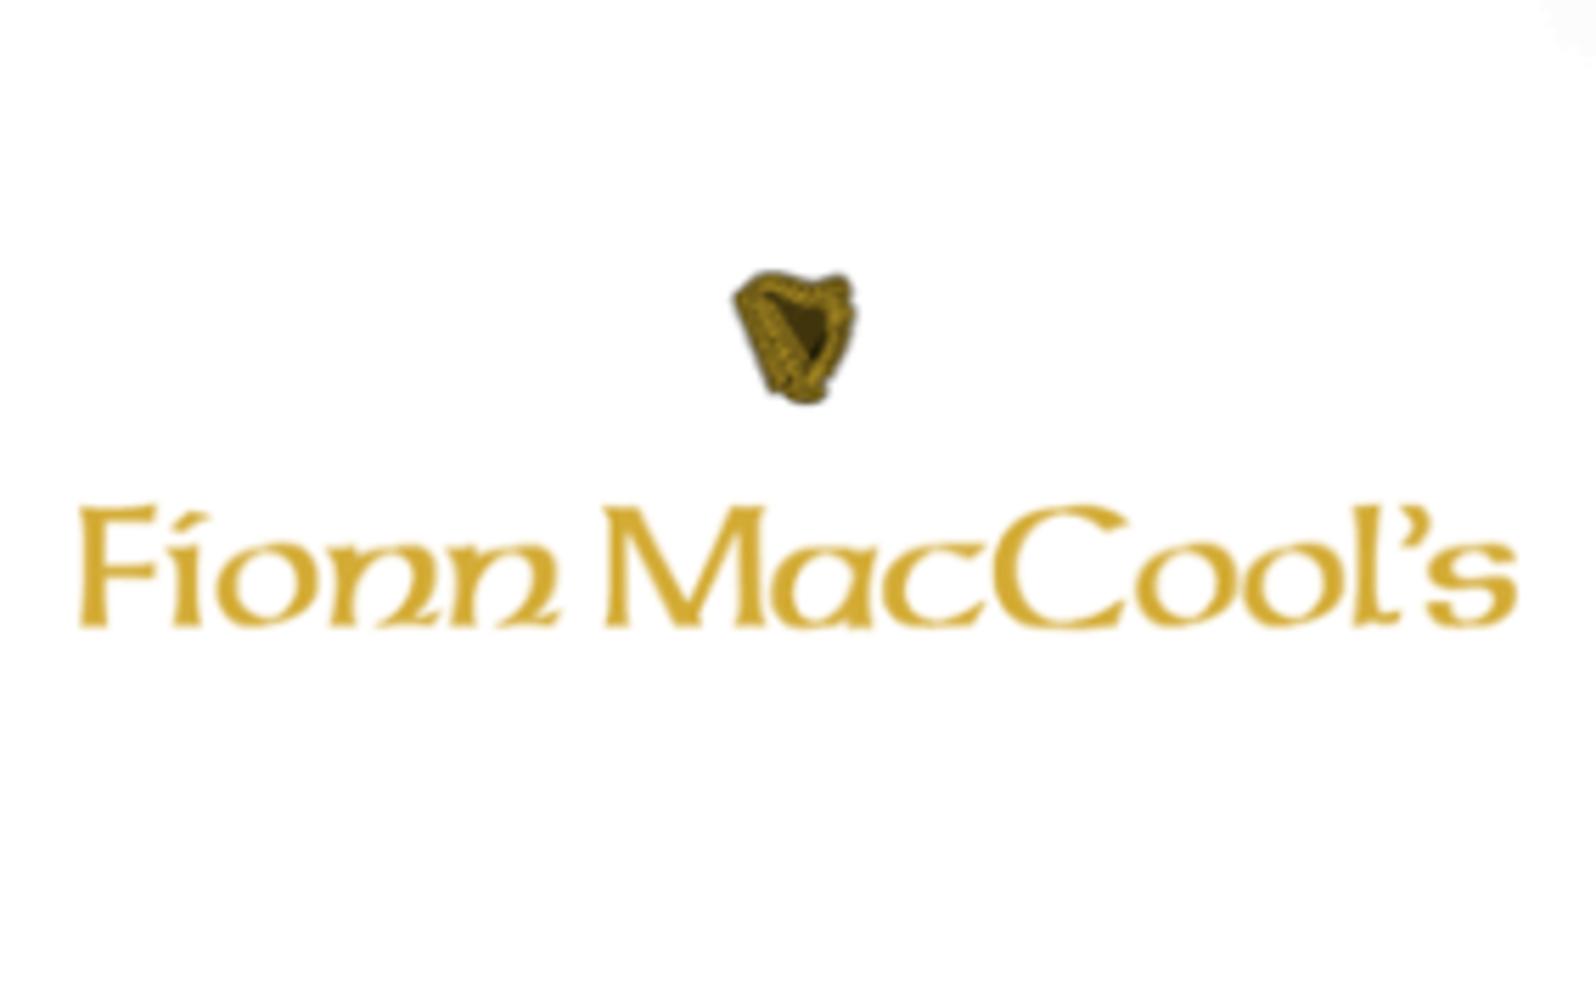 Former Fionn MacCool's Irish Pub Unreserved Timed Online Restaurant Closure Auction